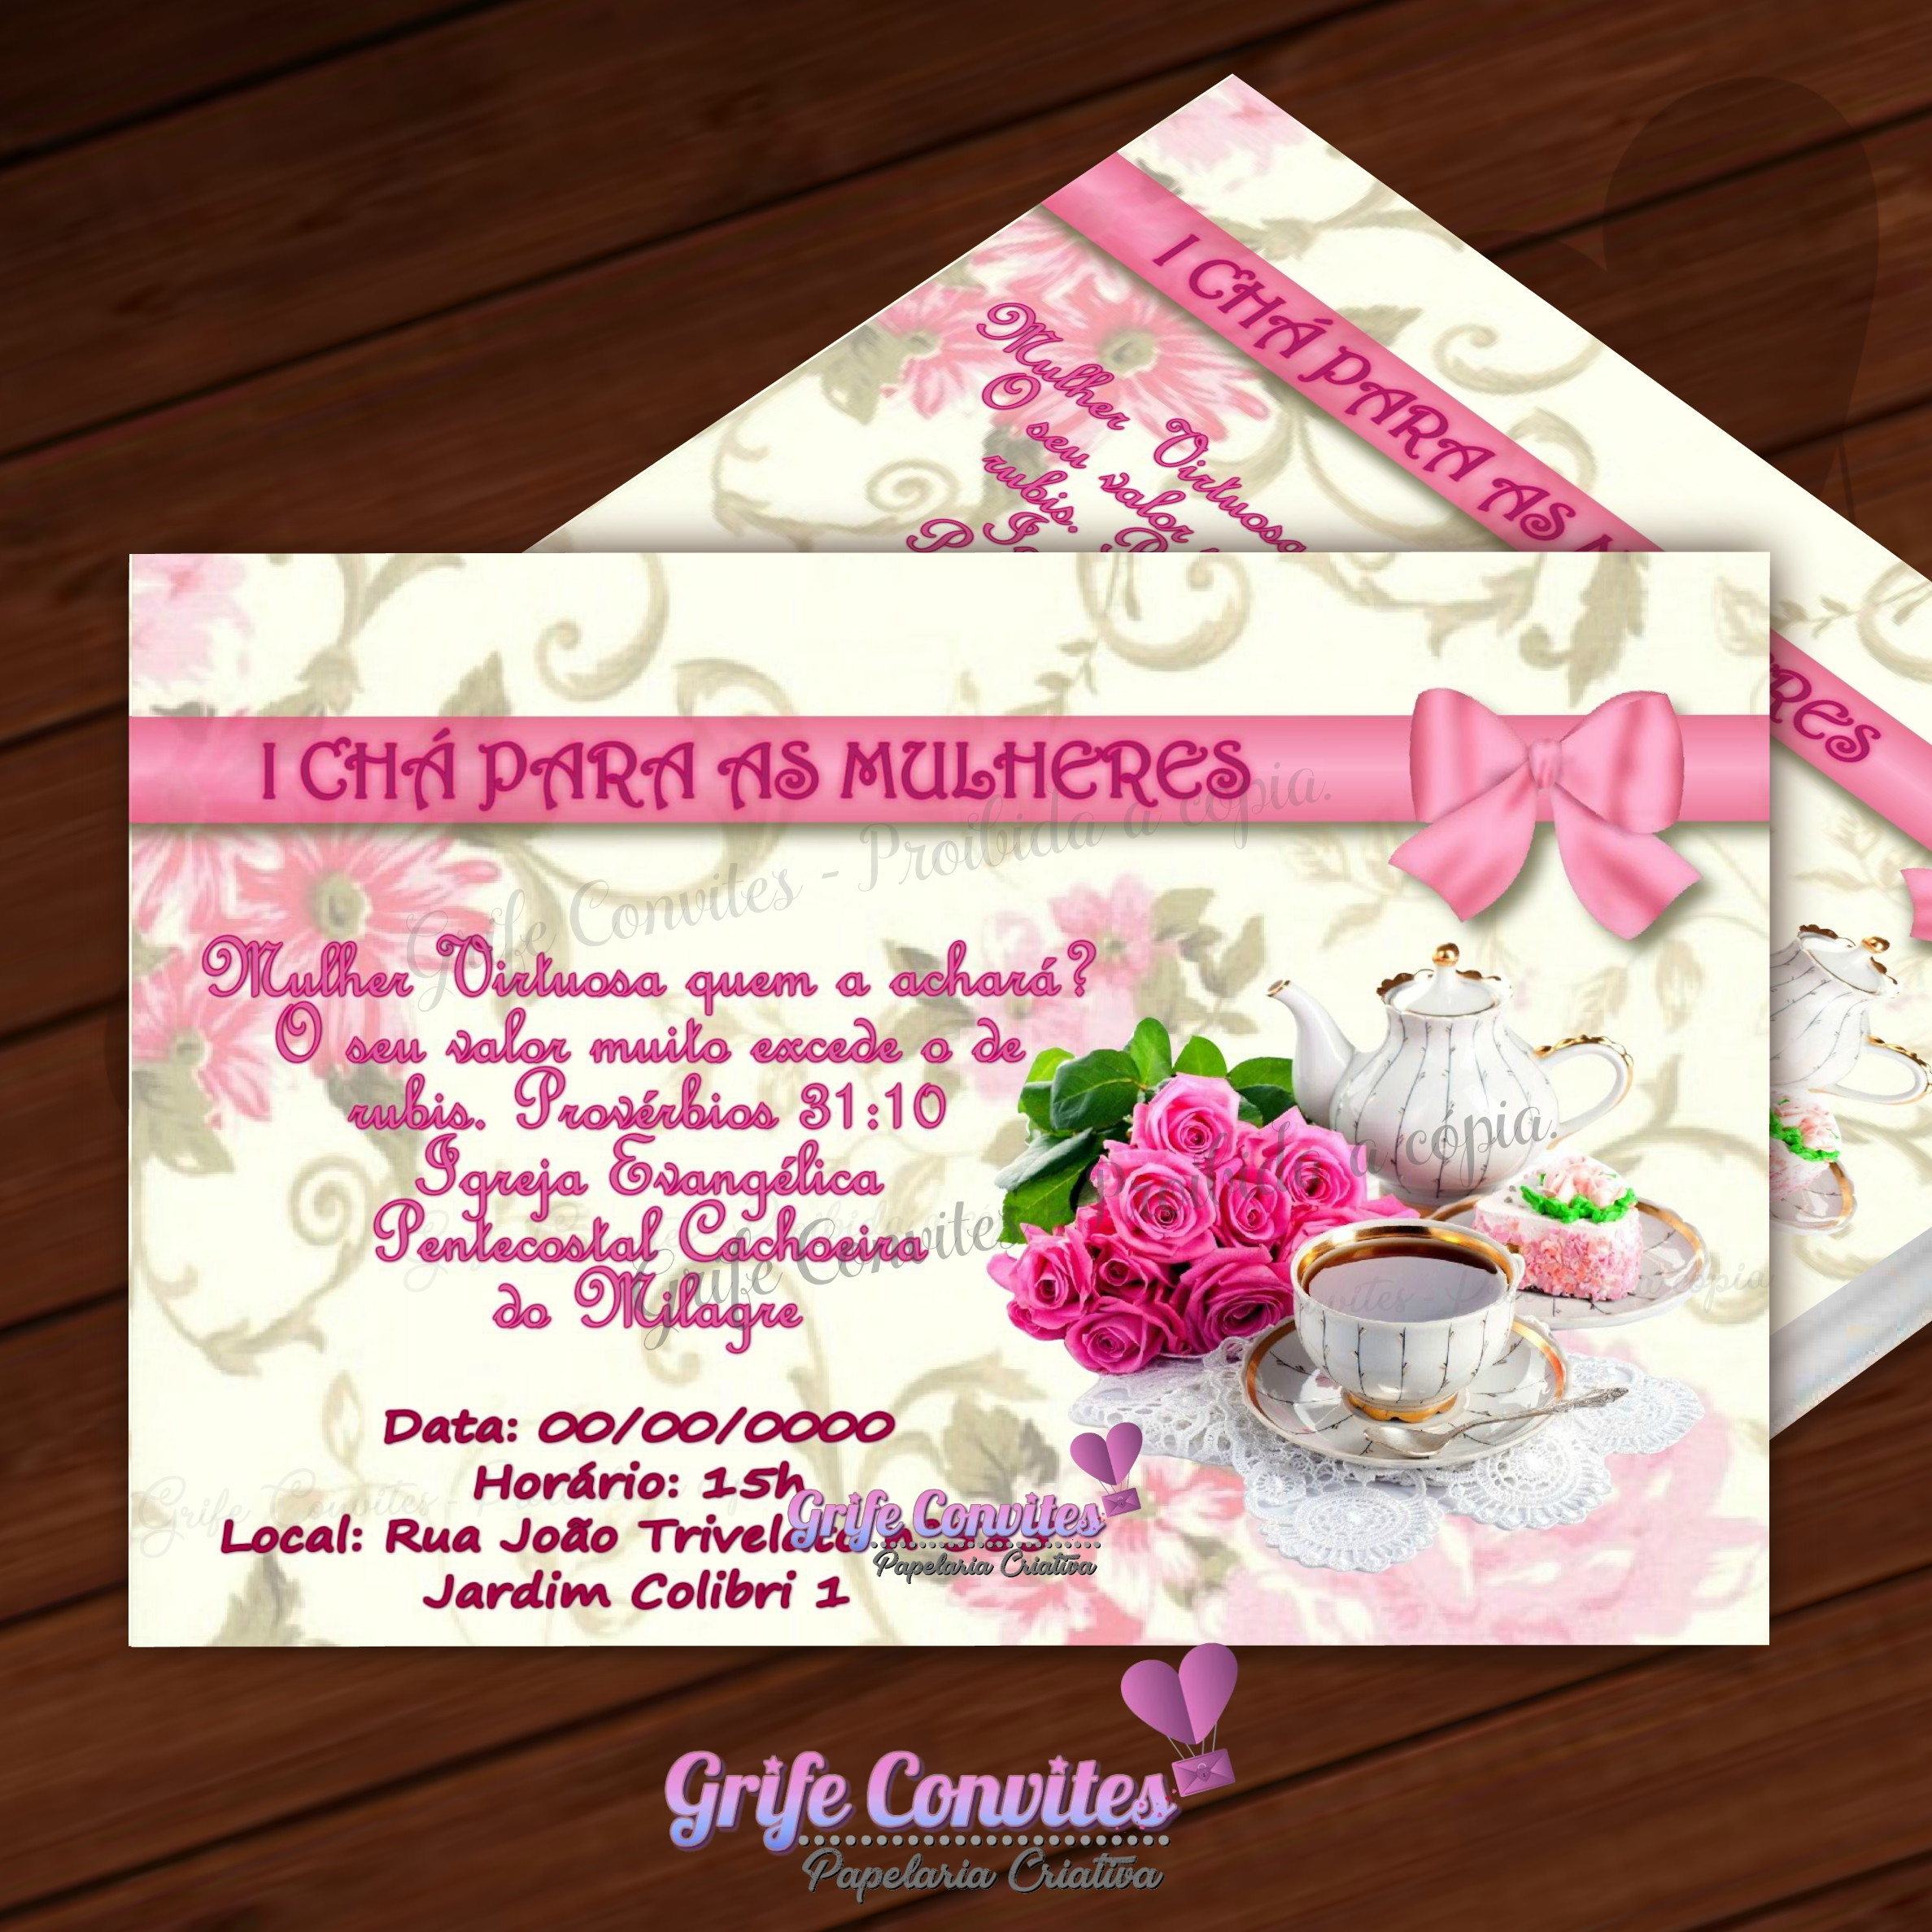 Convite Digital Cha Para Mulheres No Elo7 Grife Convites F7b859